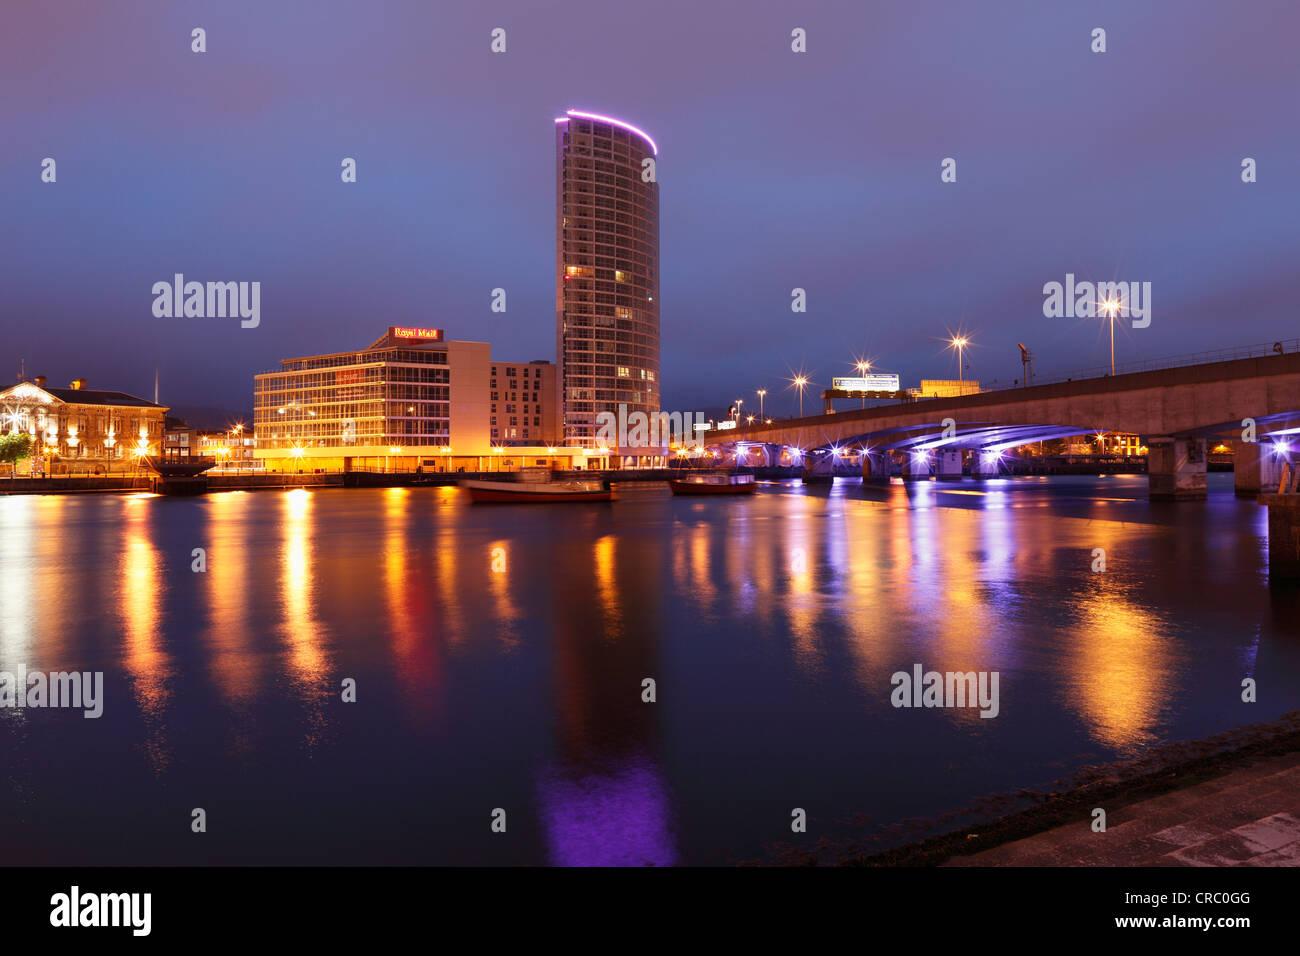 Obel Tower overlooking the River Lagan, Belfast, Northern Ireland, United Kingdom, Europe, PublicGround - Stock Image